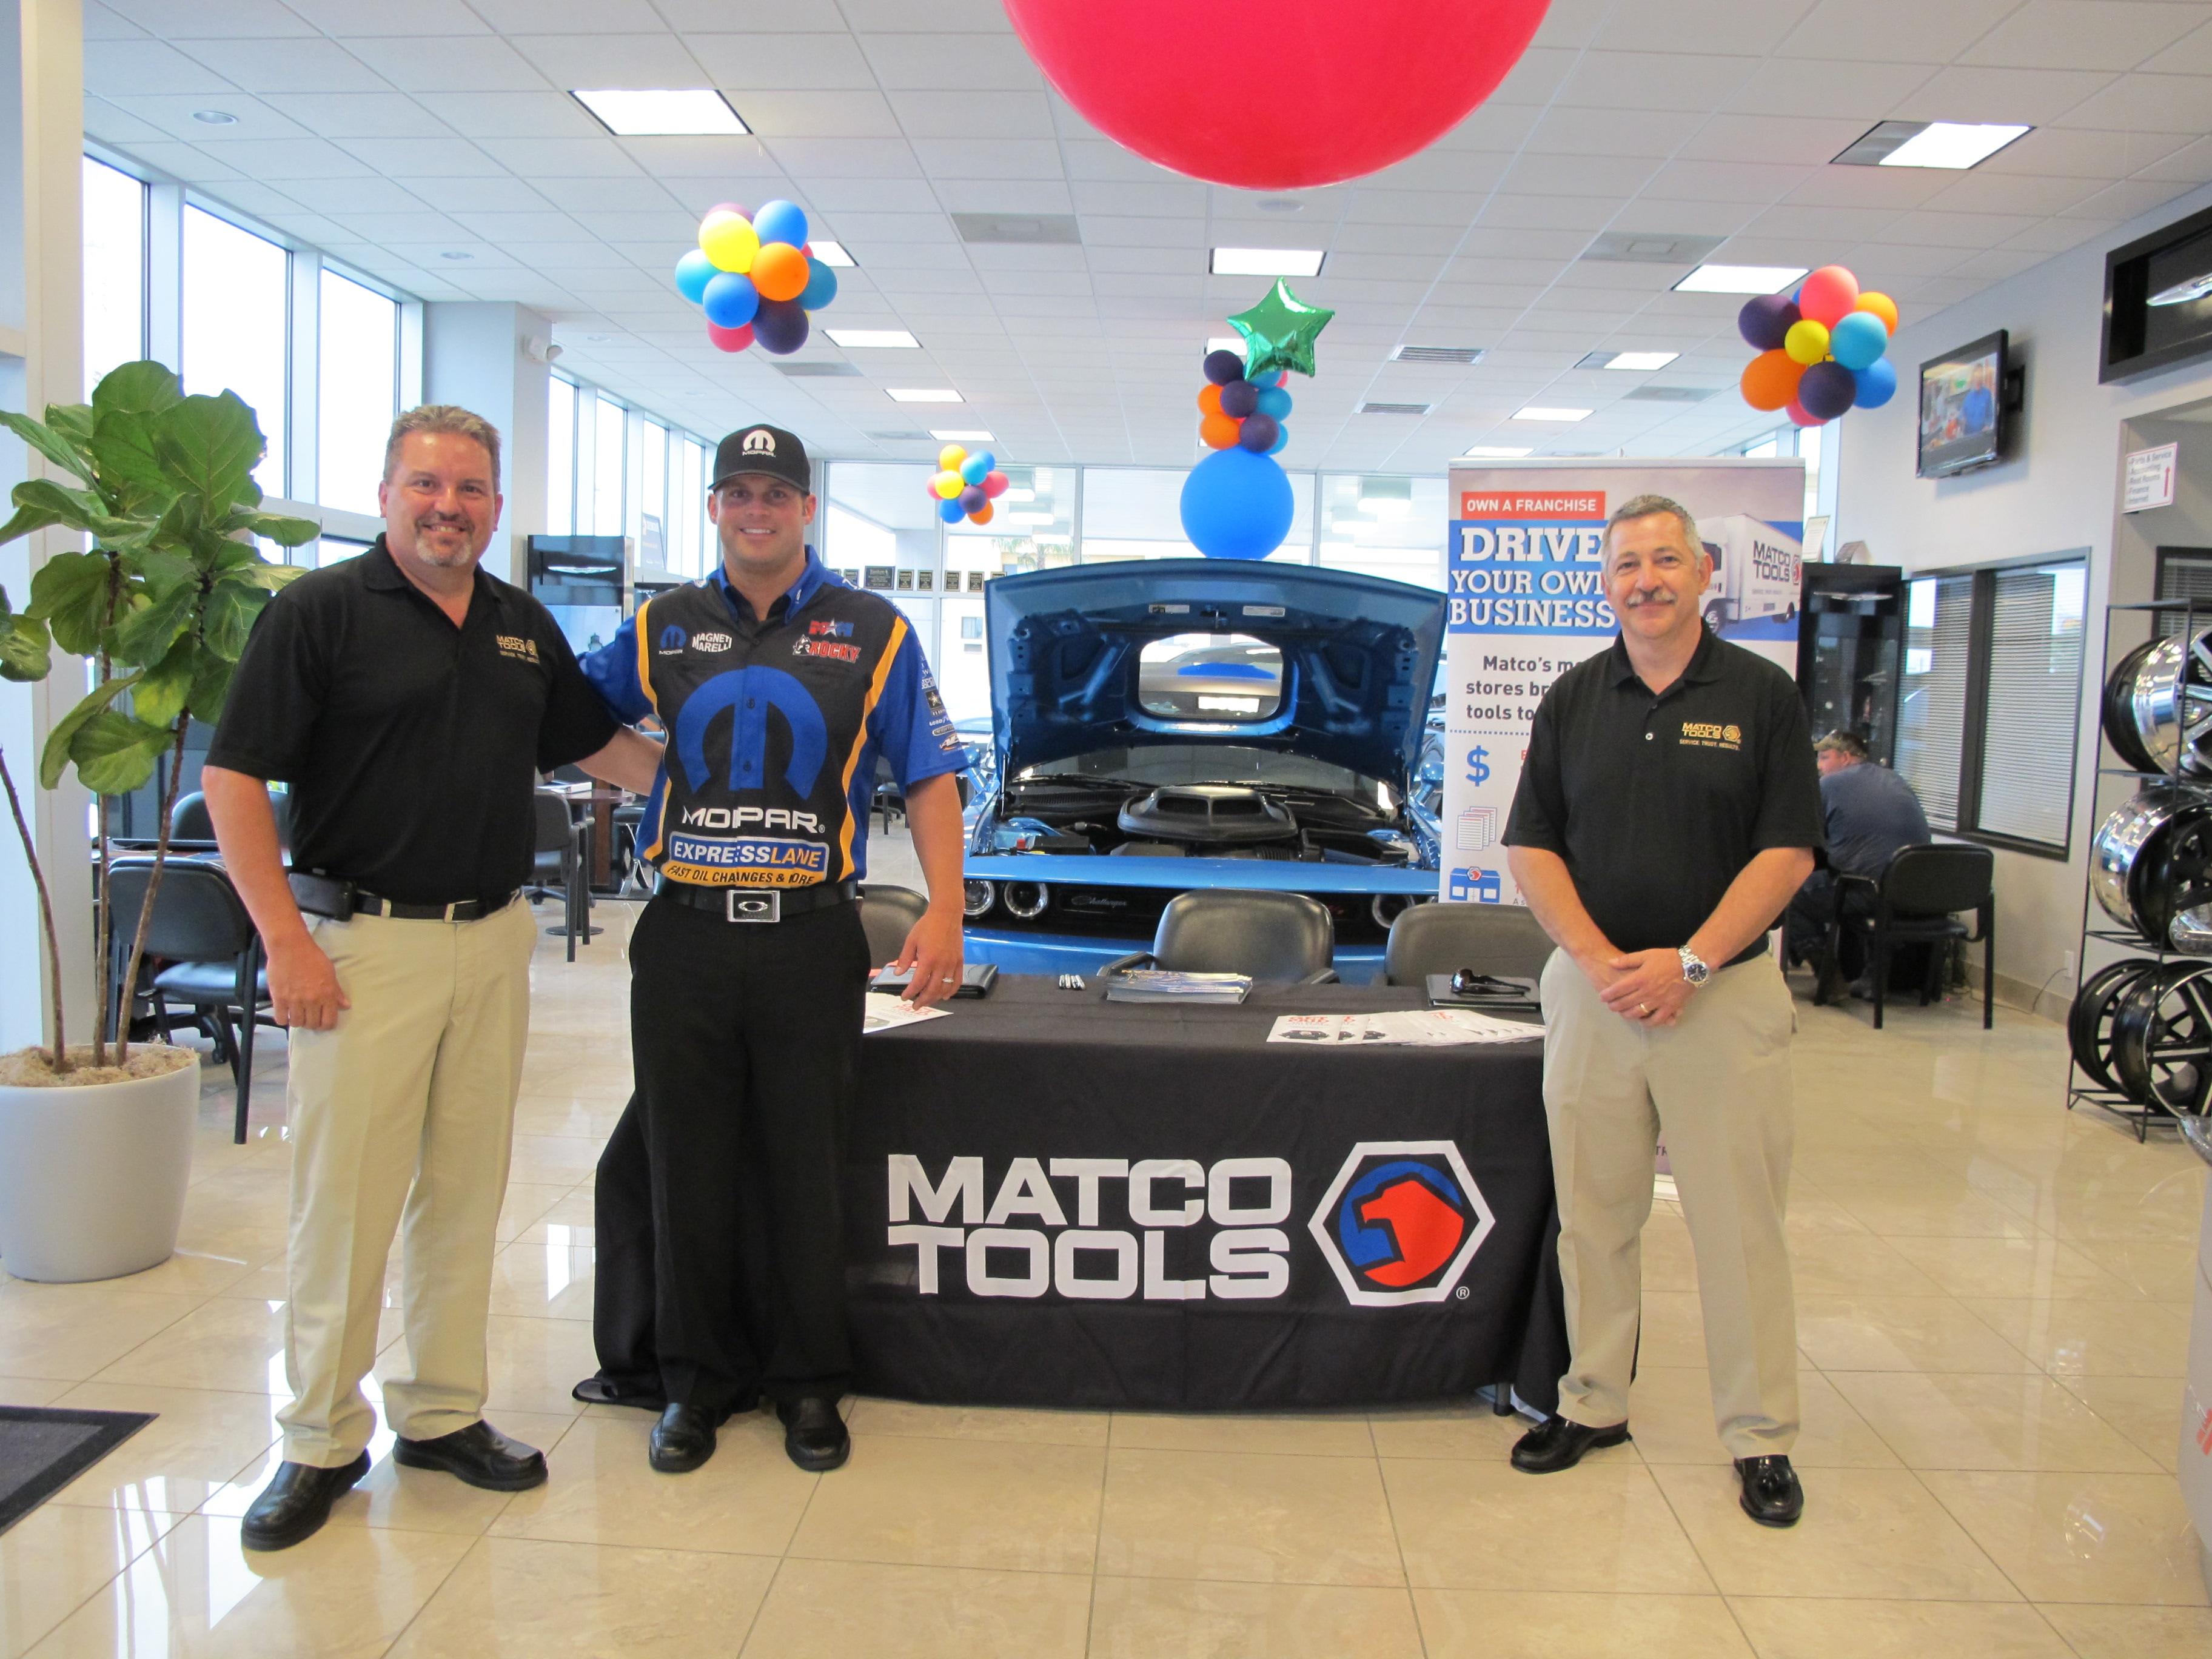 Jeep Dealership Austin >> Events and Community Service | Dodge Dealership near Crosby, TX